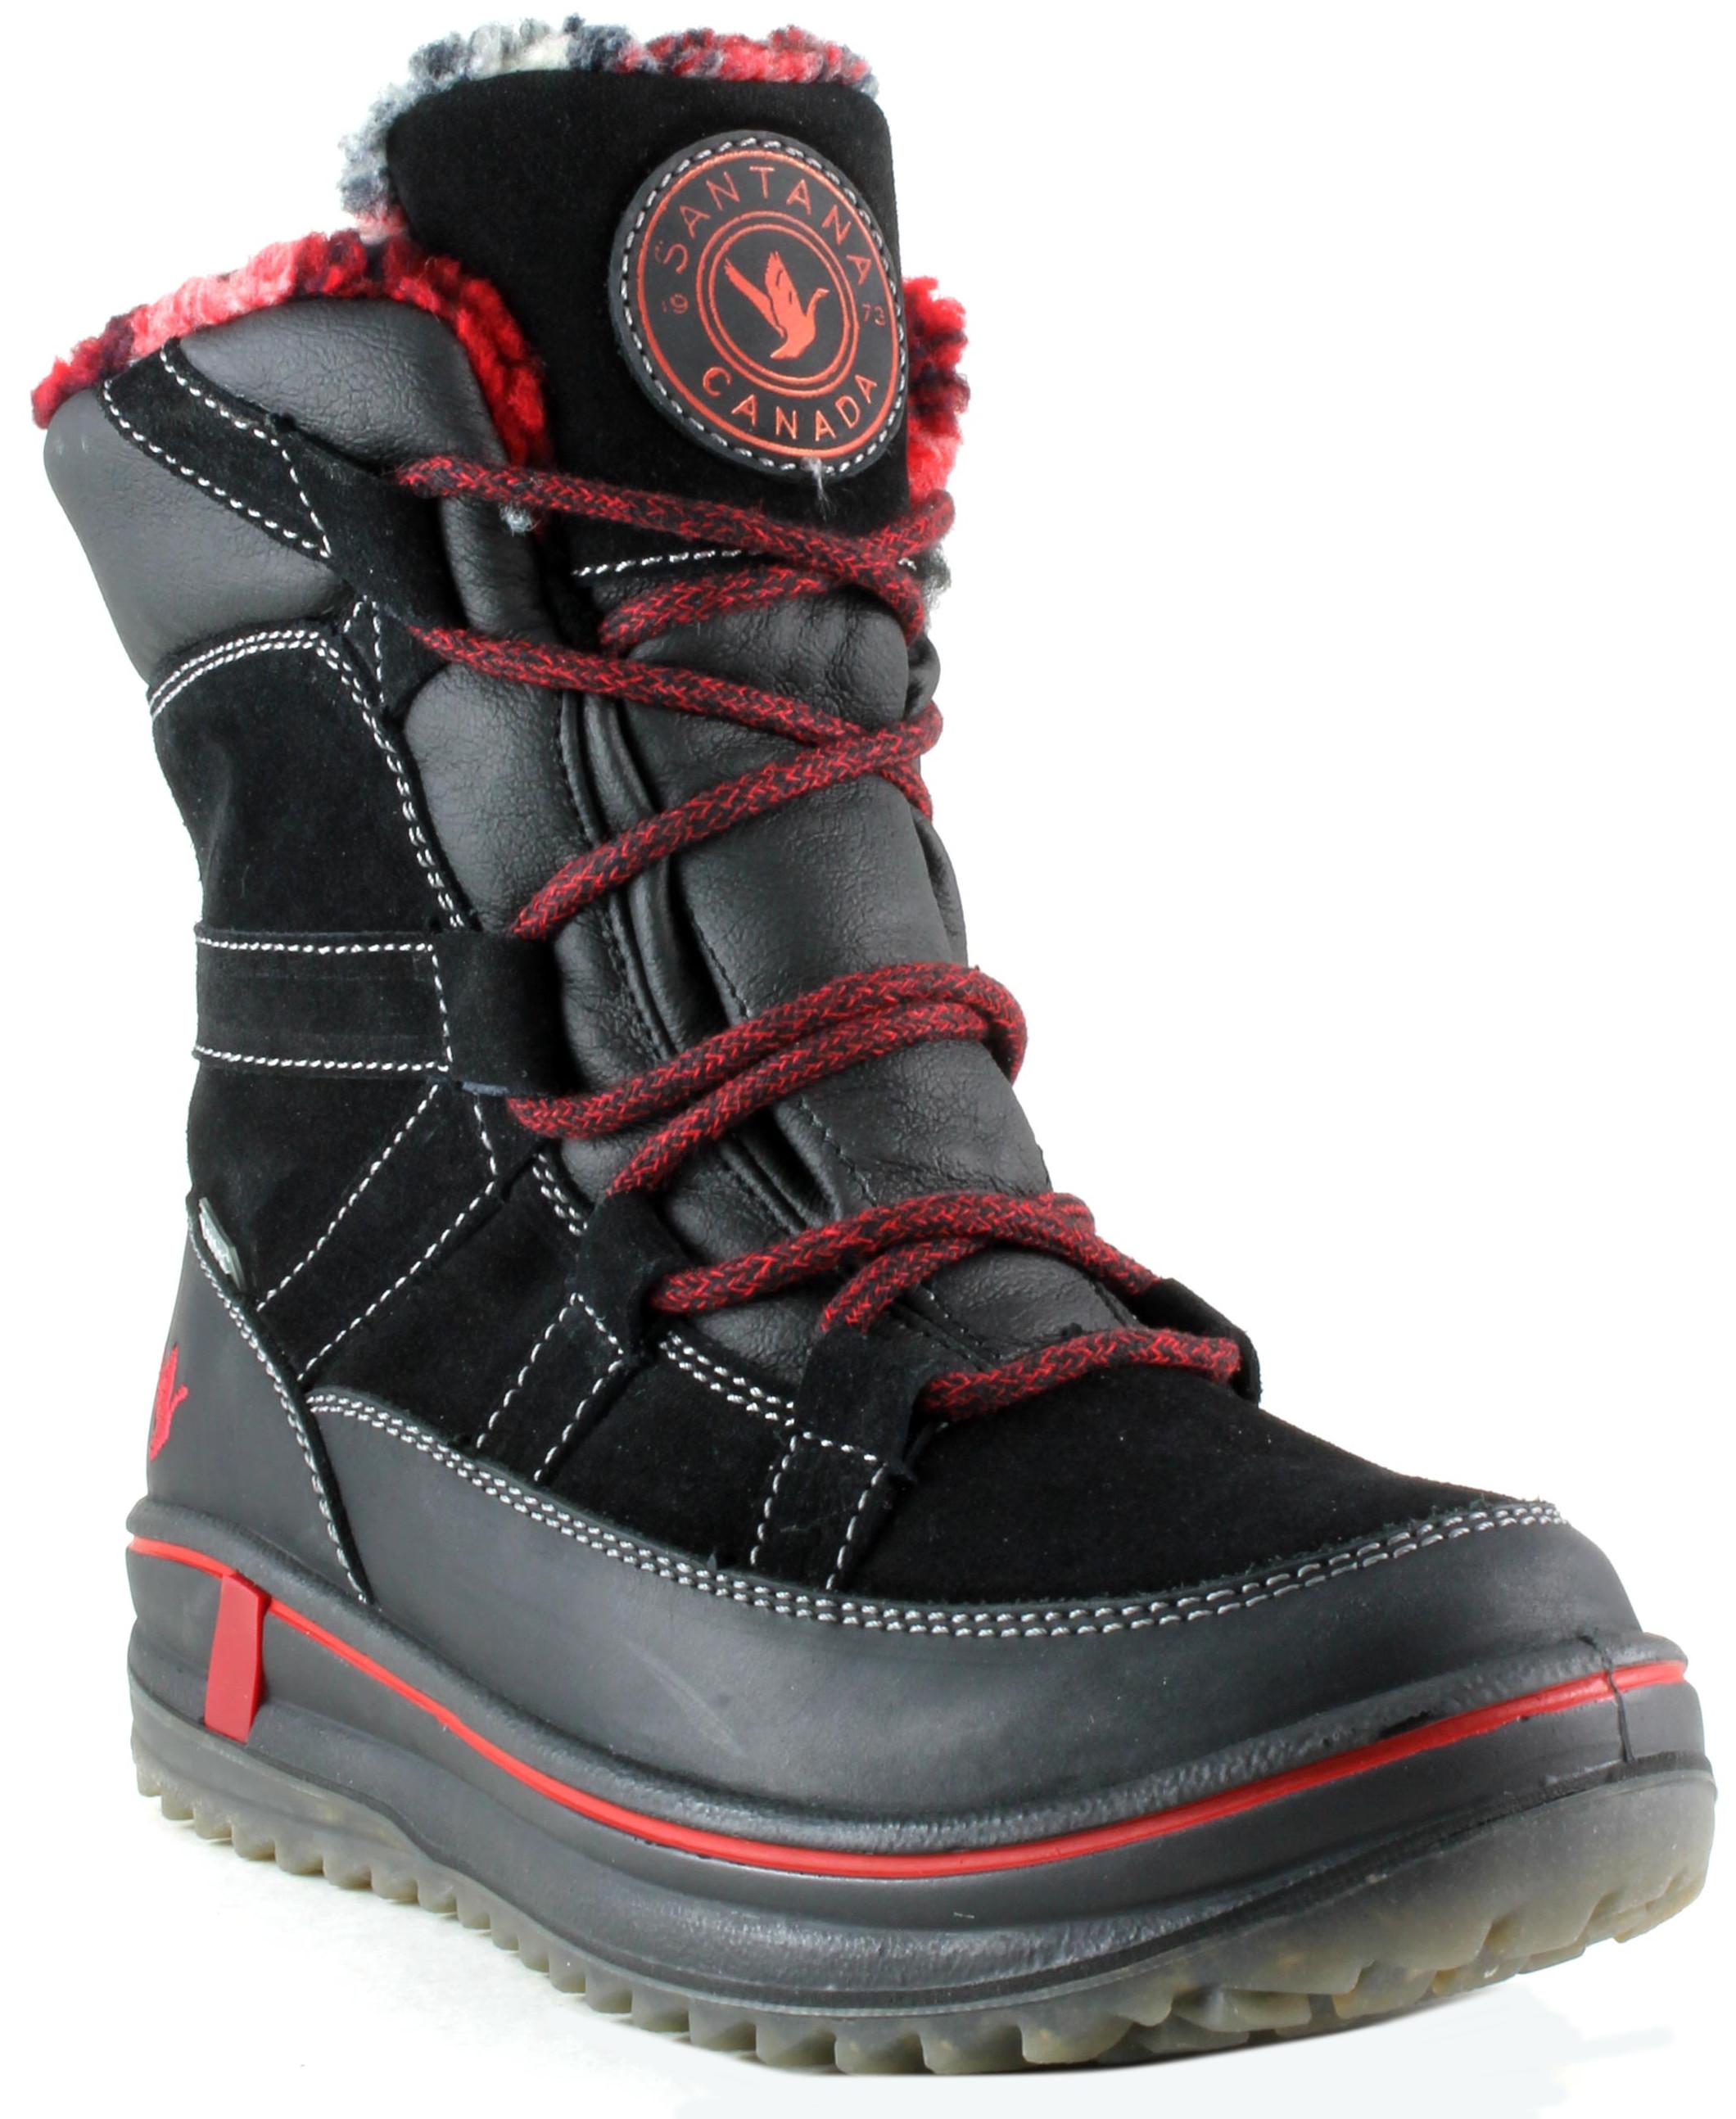 84a497d05f27d Santana Canada Pike Winter Boot - Women's | 48% Off w/ Free Shipping